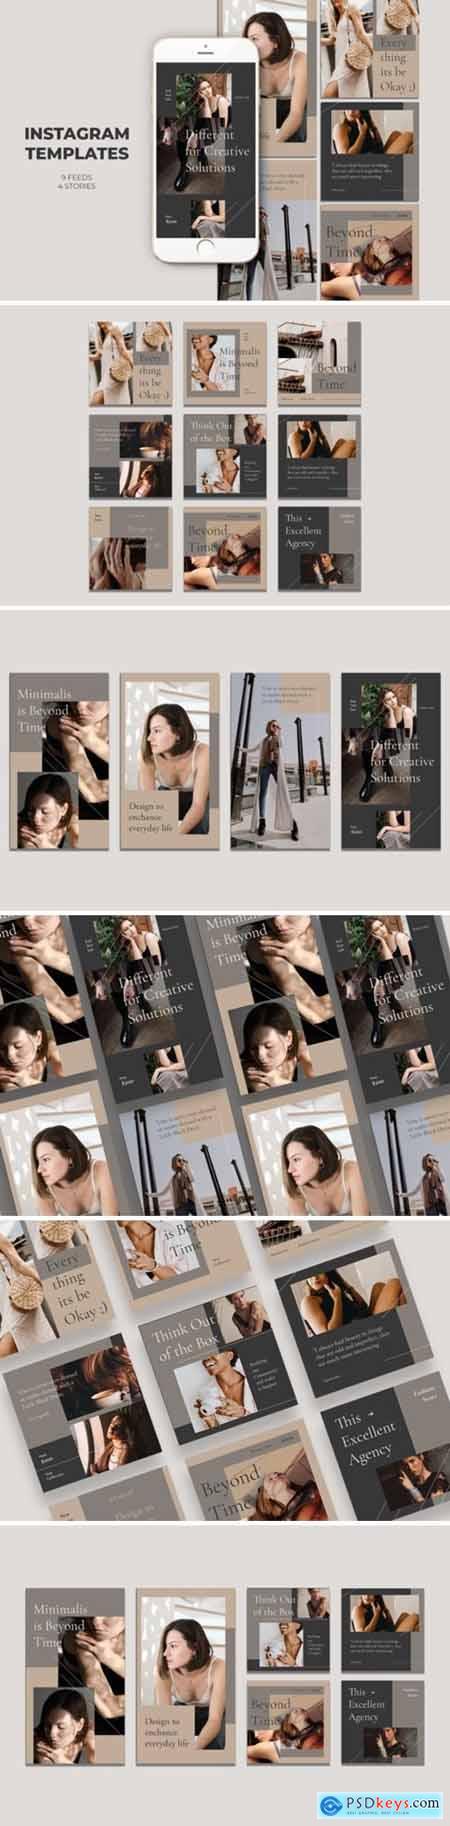 Fashion Instagram Templates 2654520